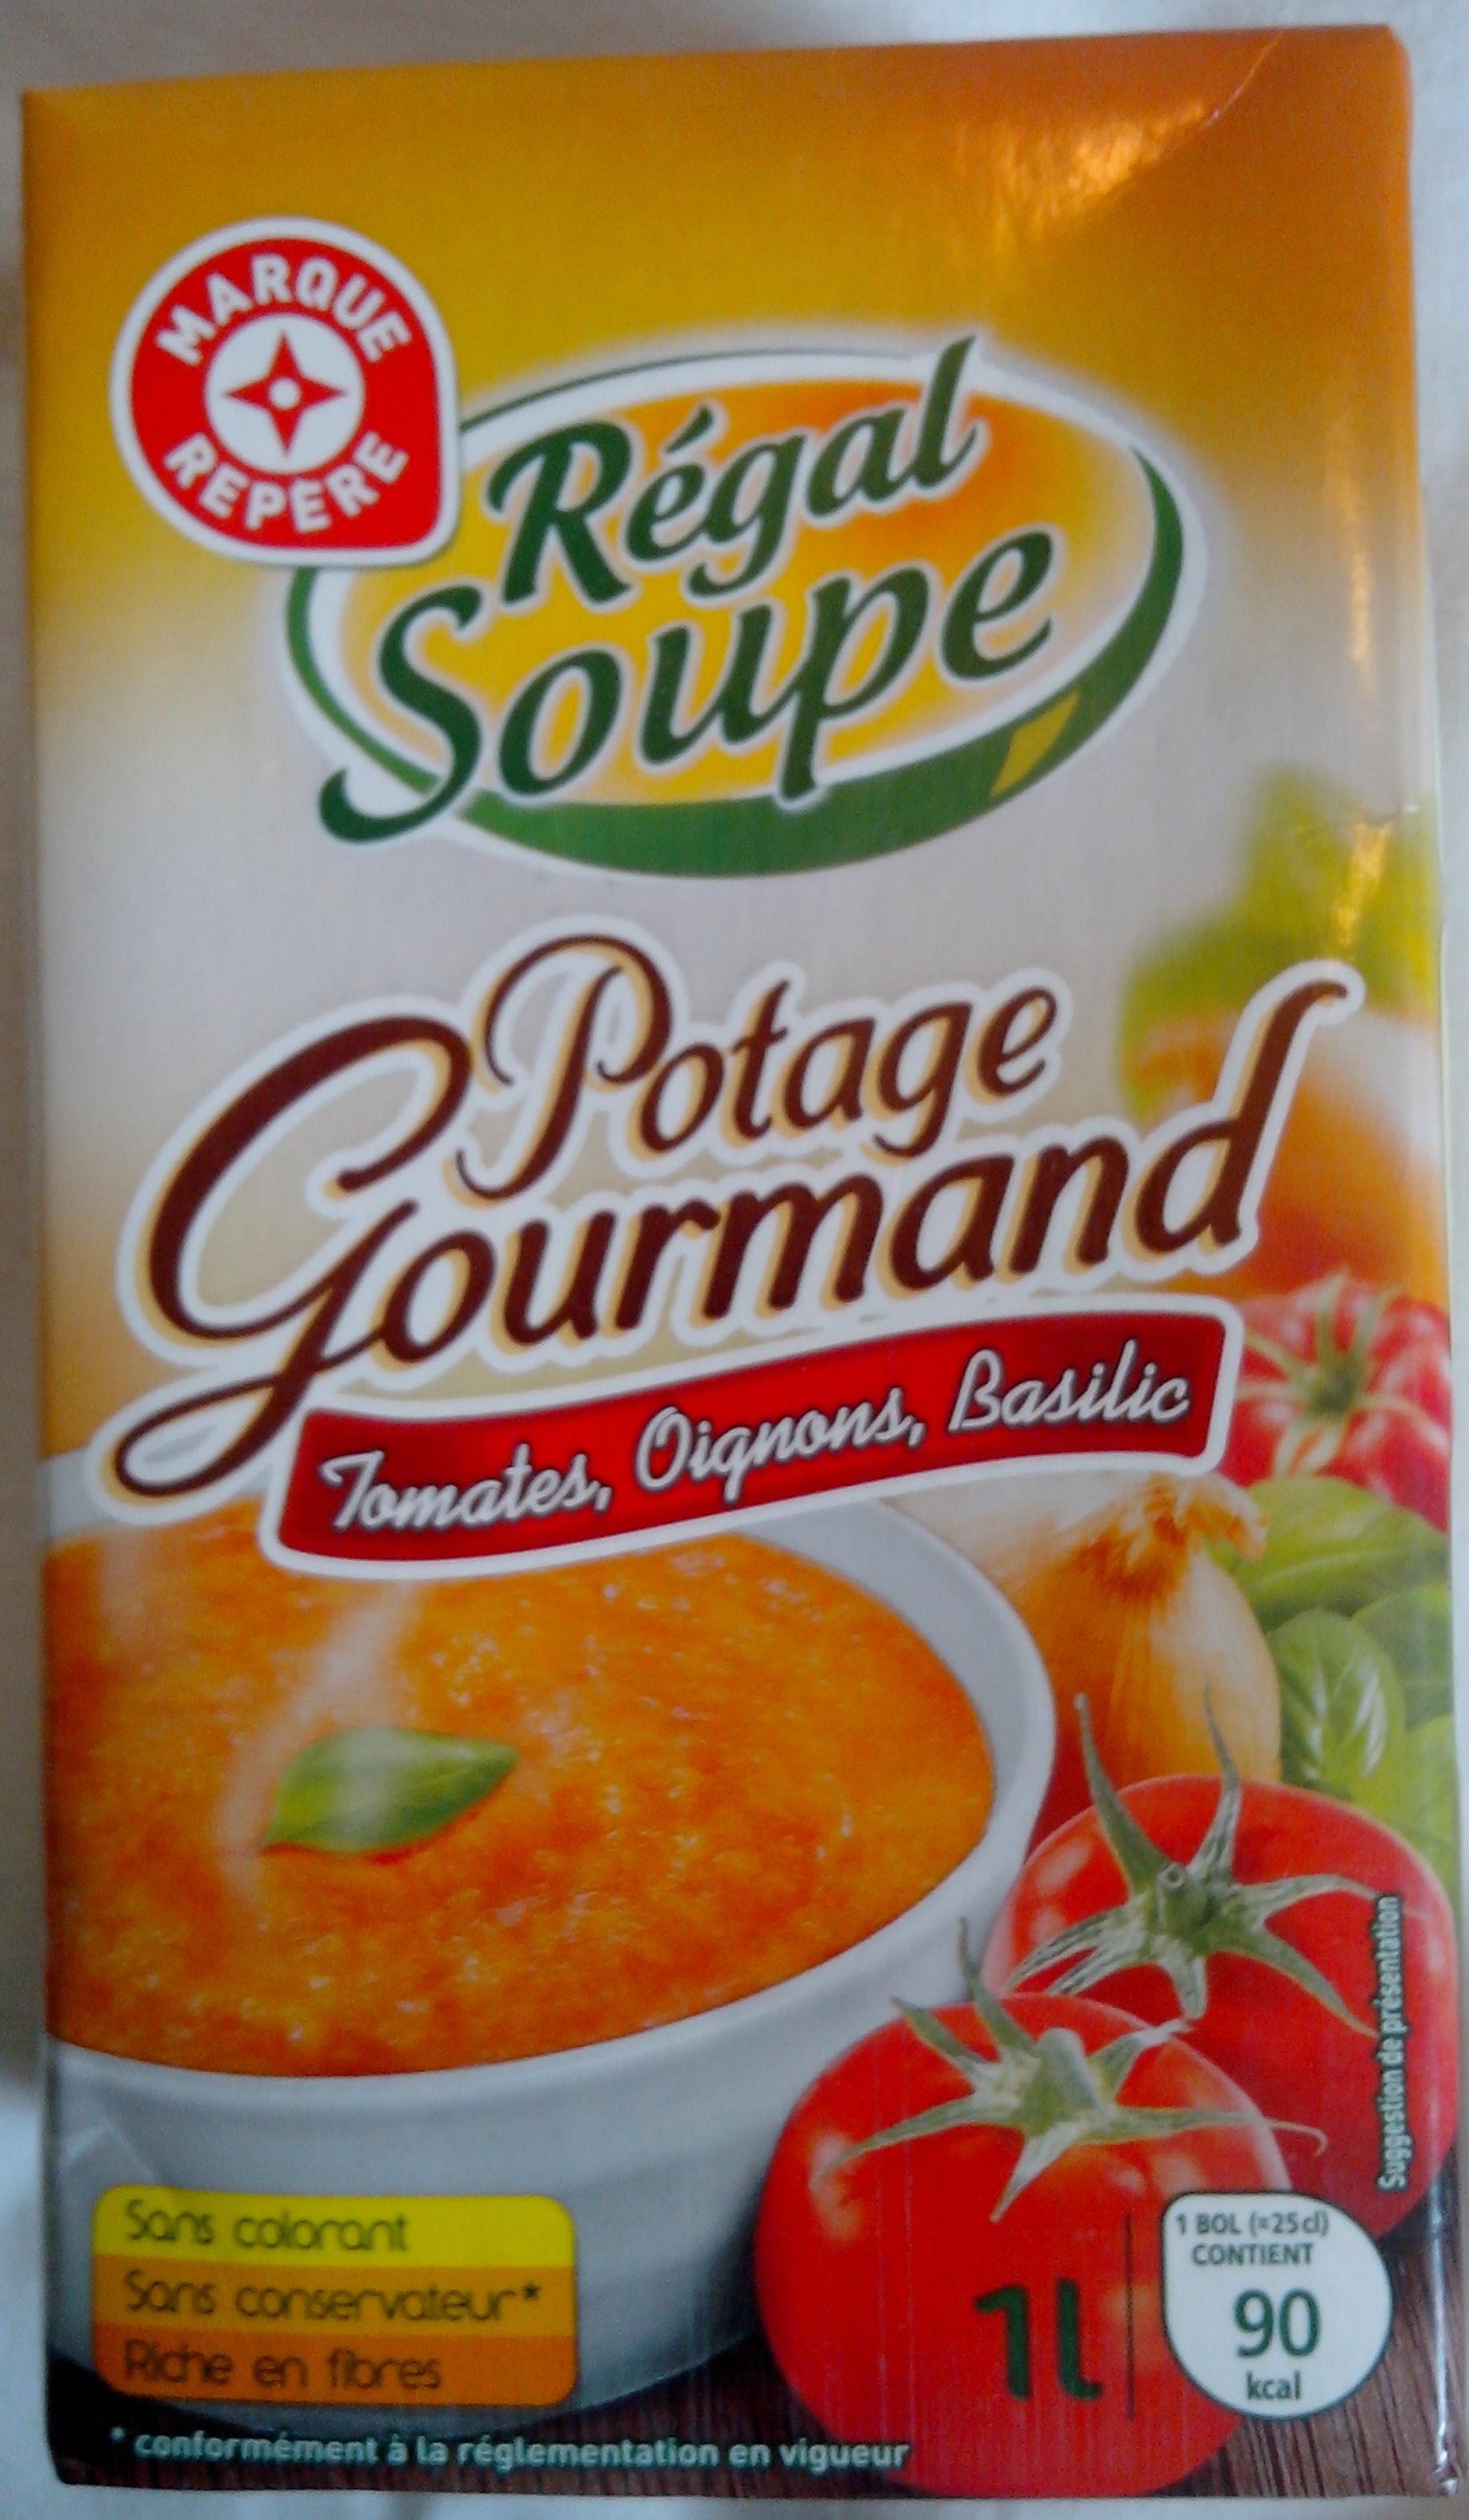 Potage gourmand tomates, oignons et basilic - Product